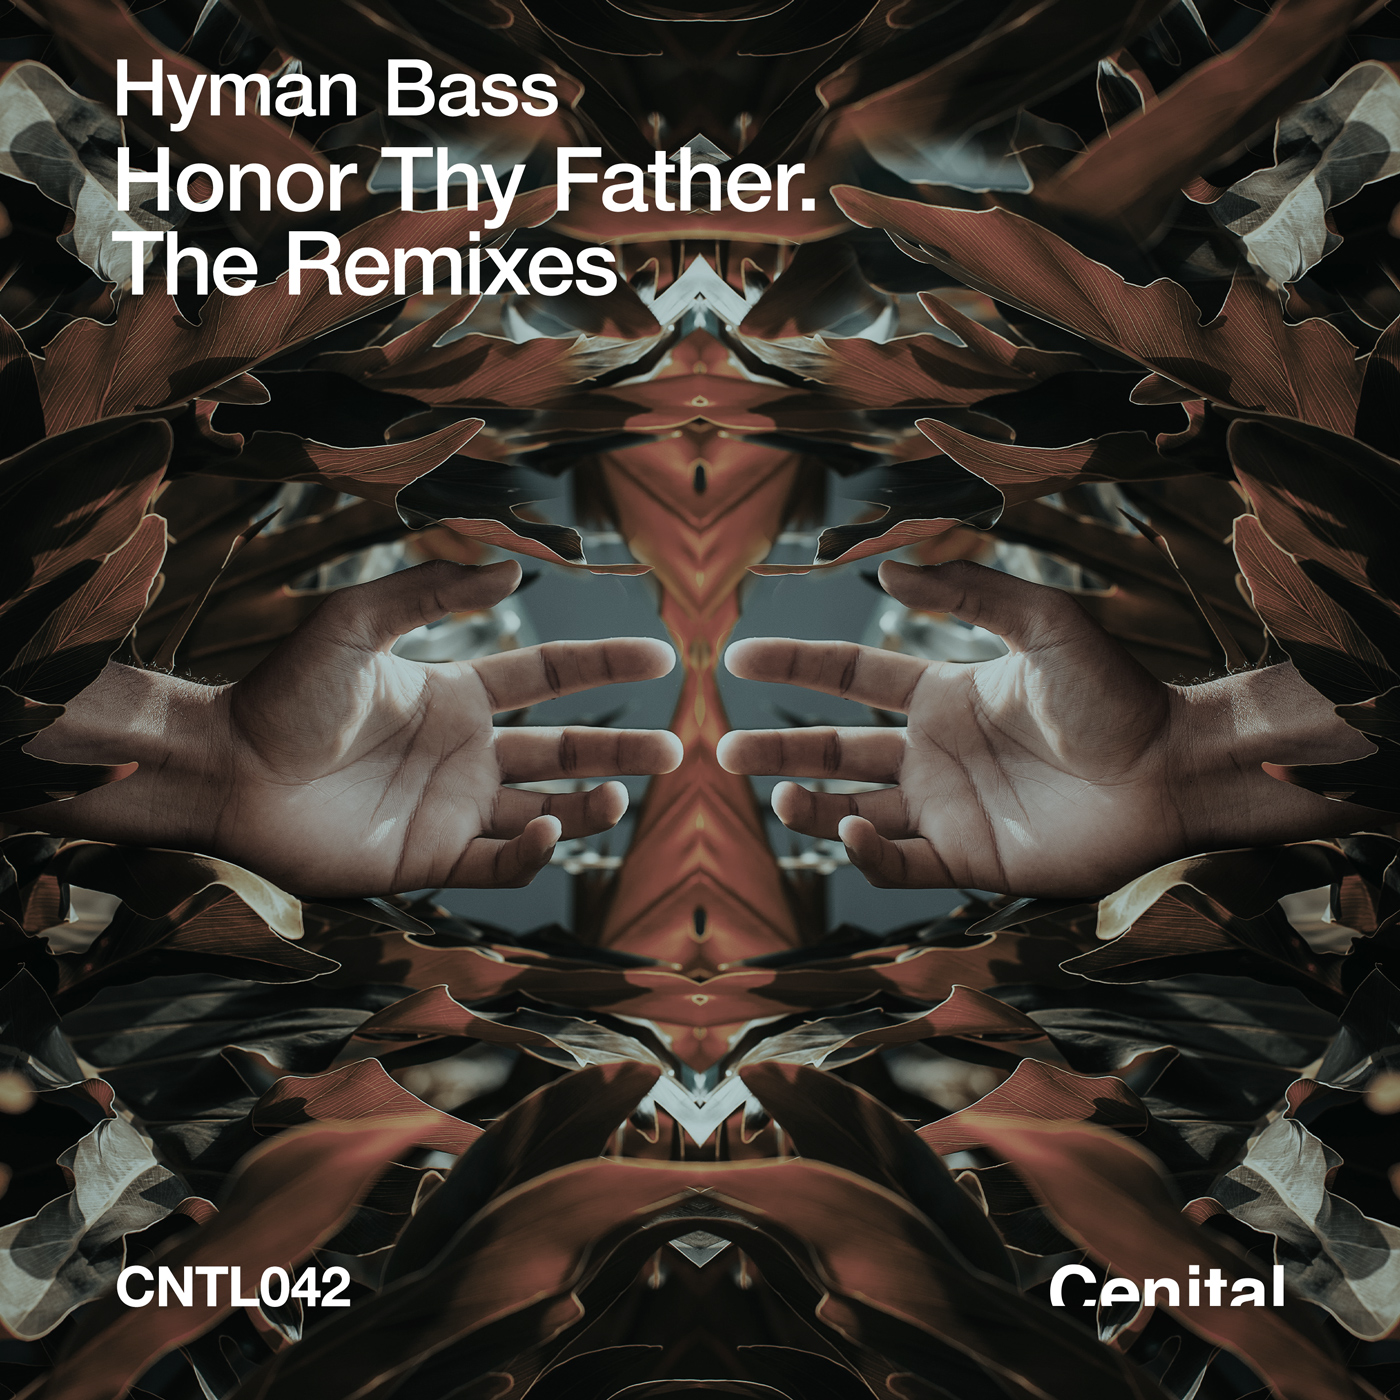 Hyman Bass - Honor Thy Father. Remixes [CNTL042]